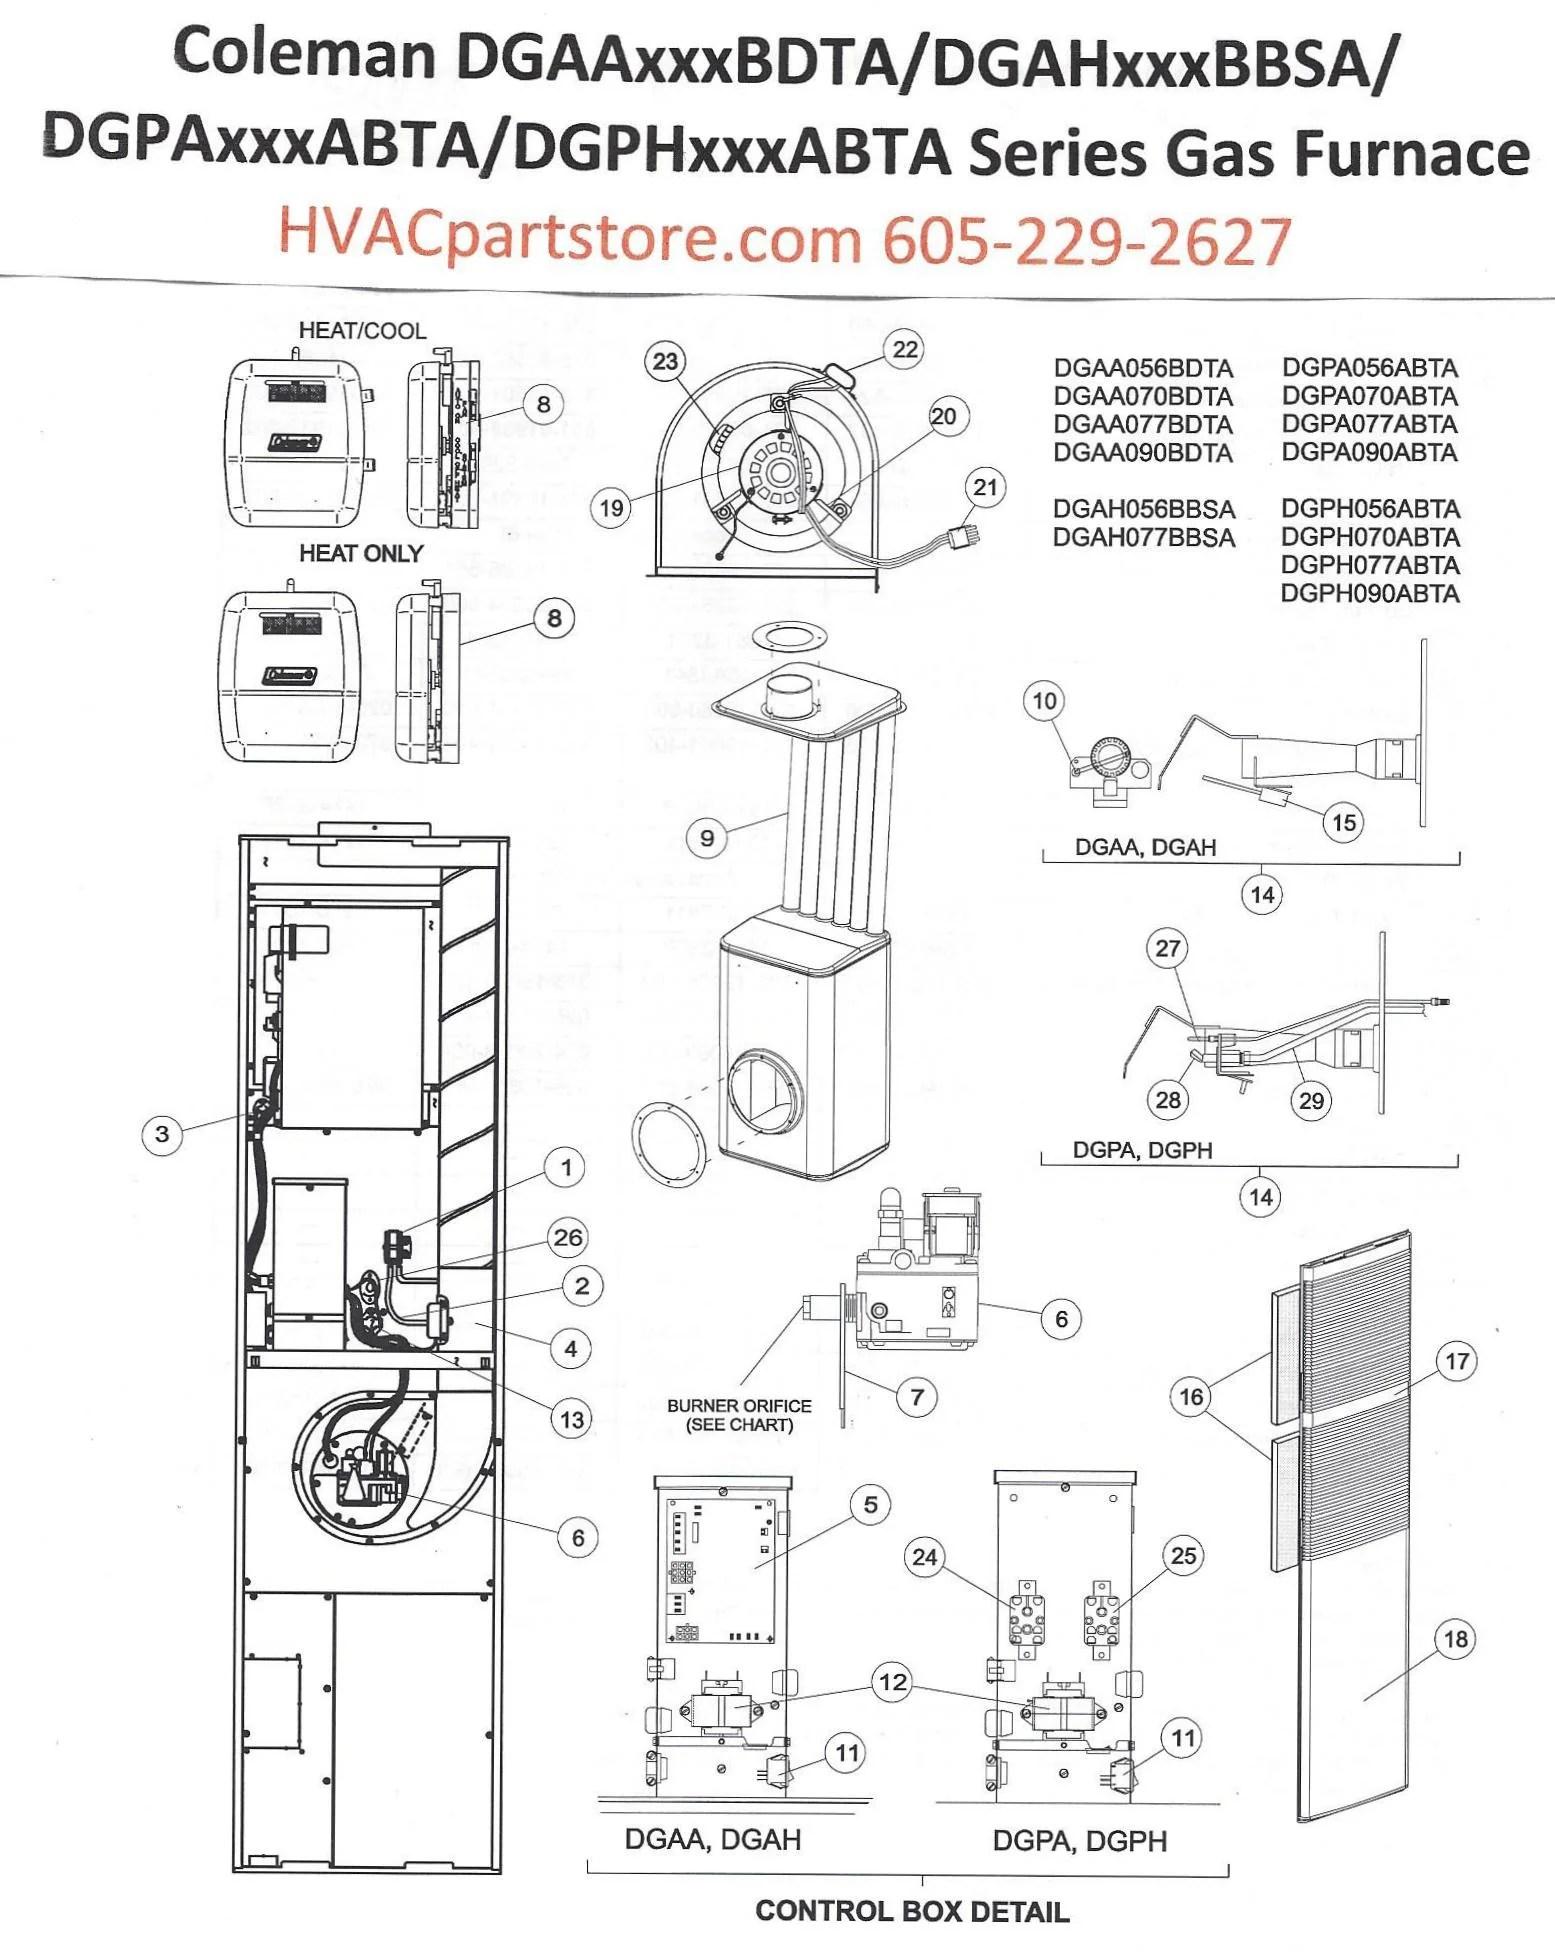 DGPH056ABTA Coleman Gas Furnace Parts – HVACpartstore